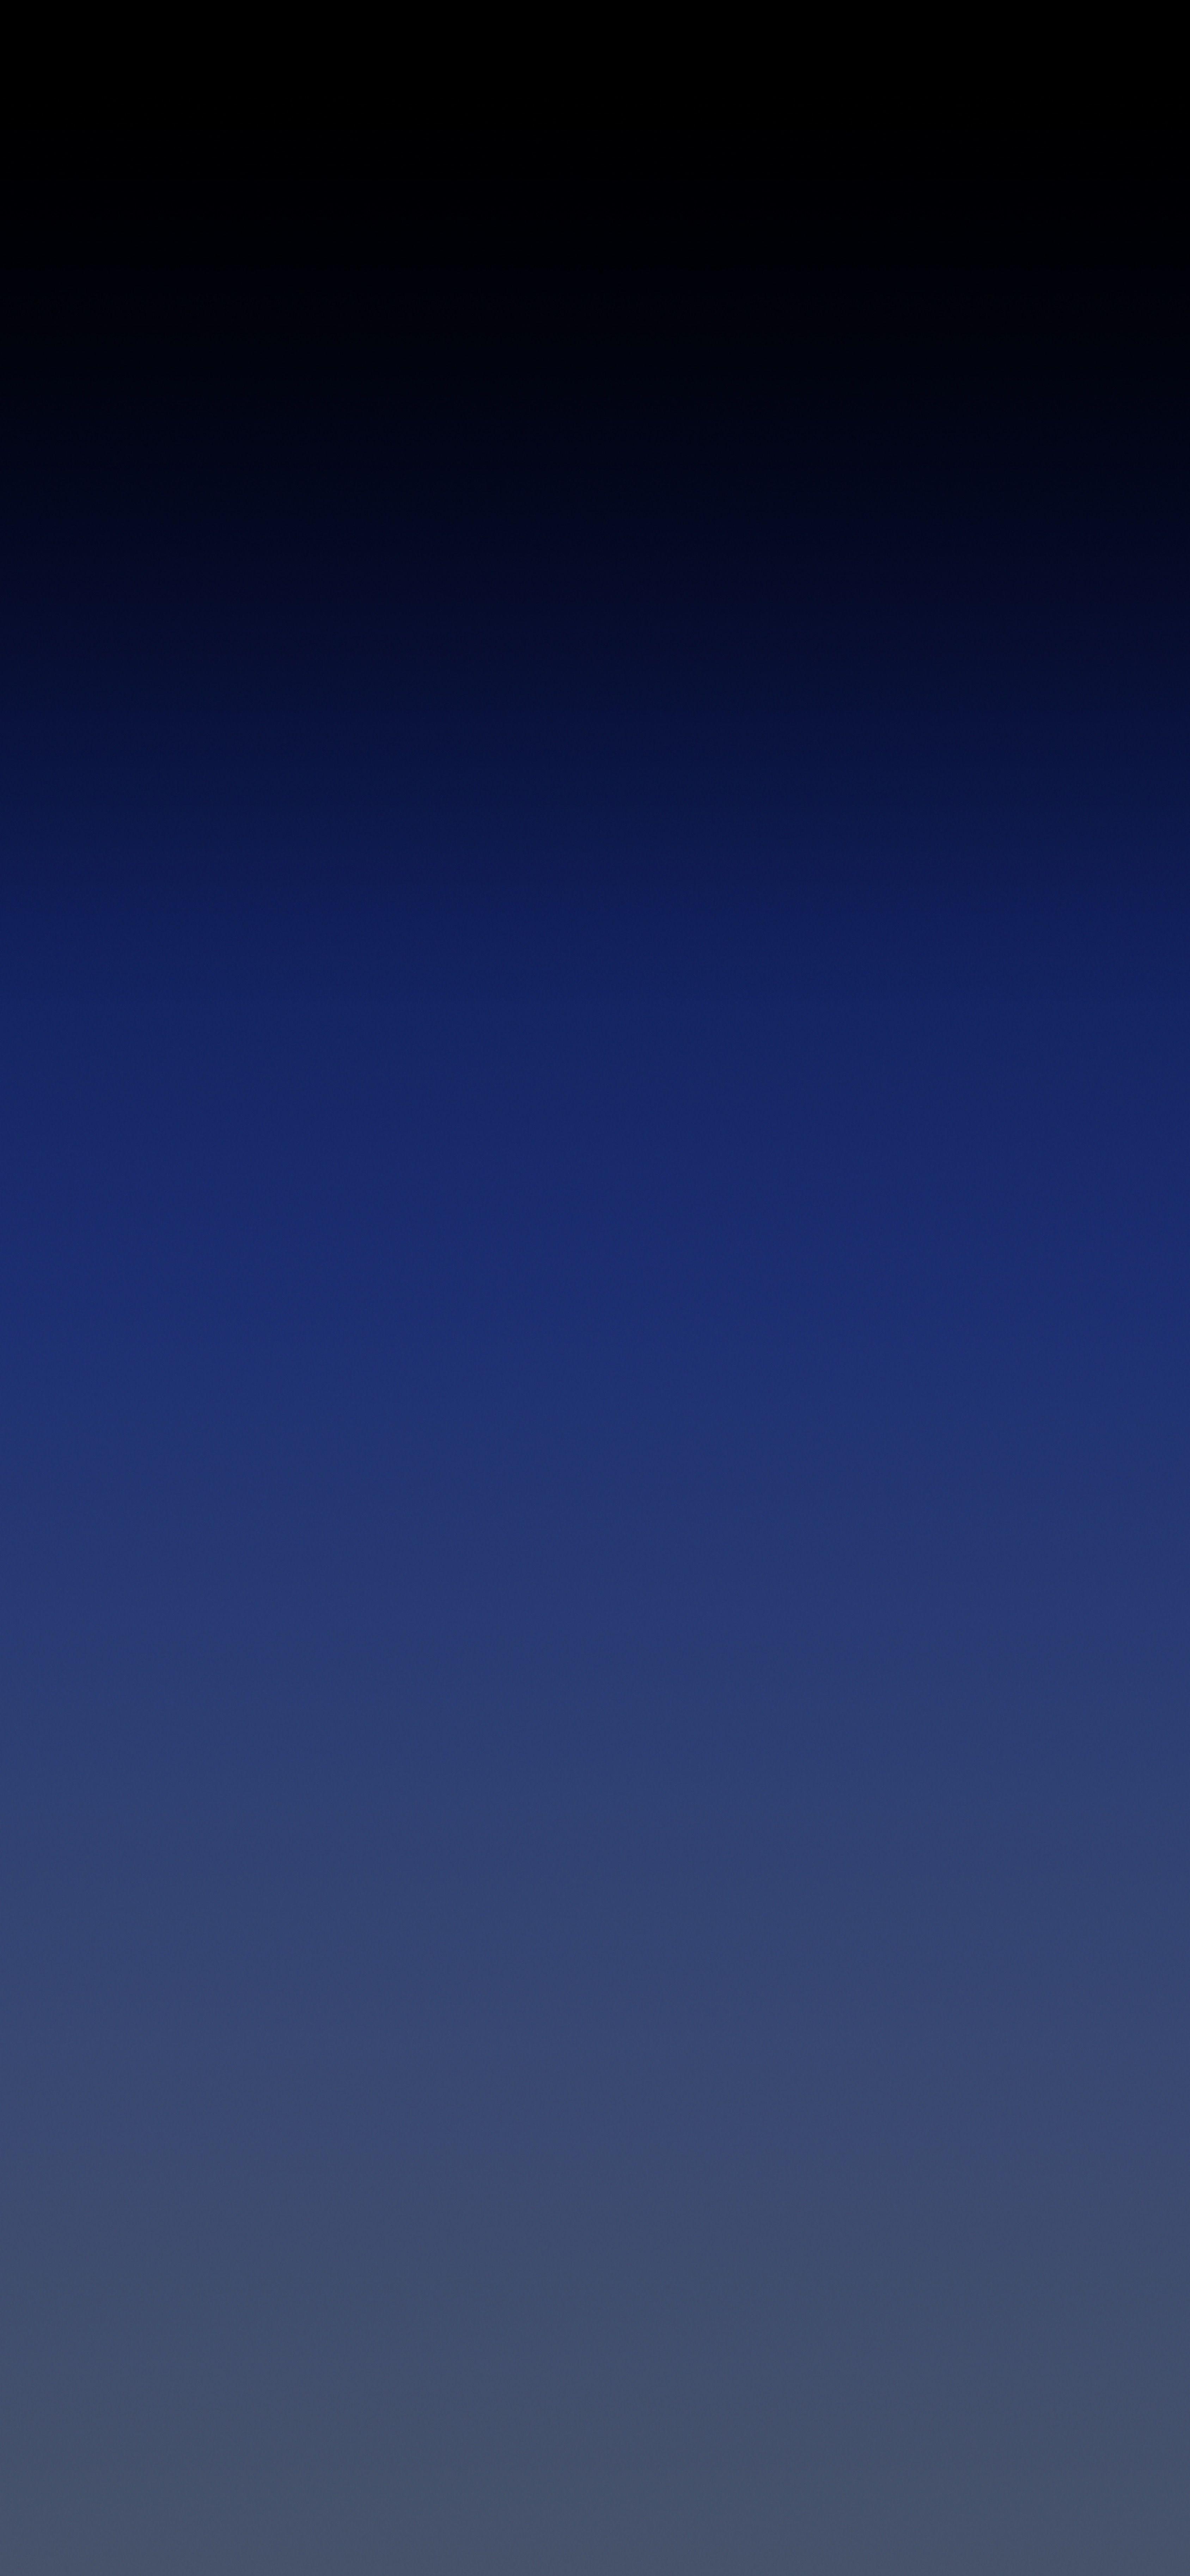 Dark Blue Gradient Backgrounds - Wallpaper Cave